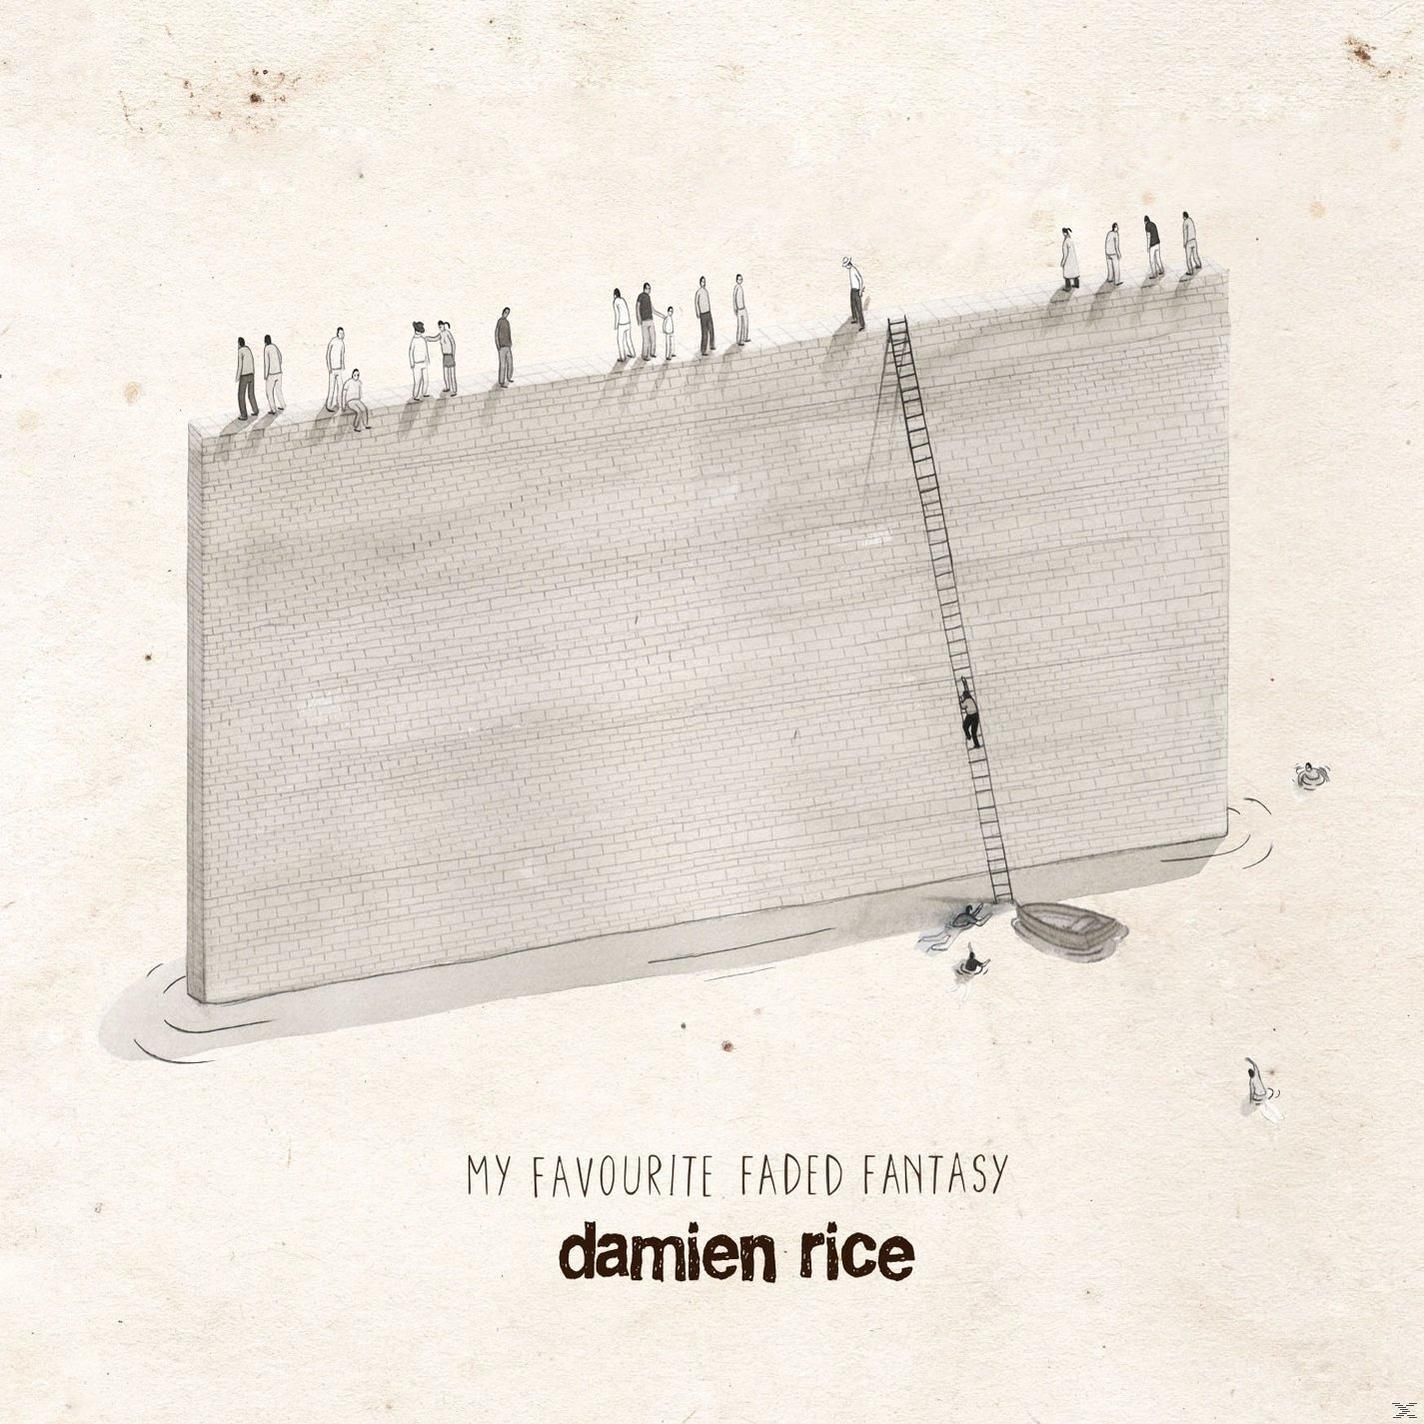 My Favourite Faded Fantasy (Damien Rice) für 17,99 Euro